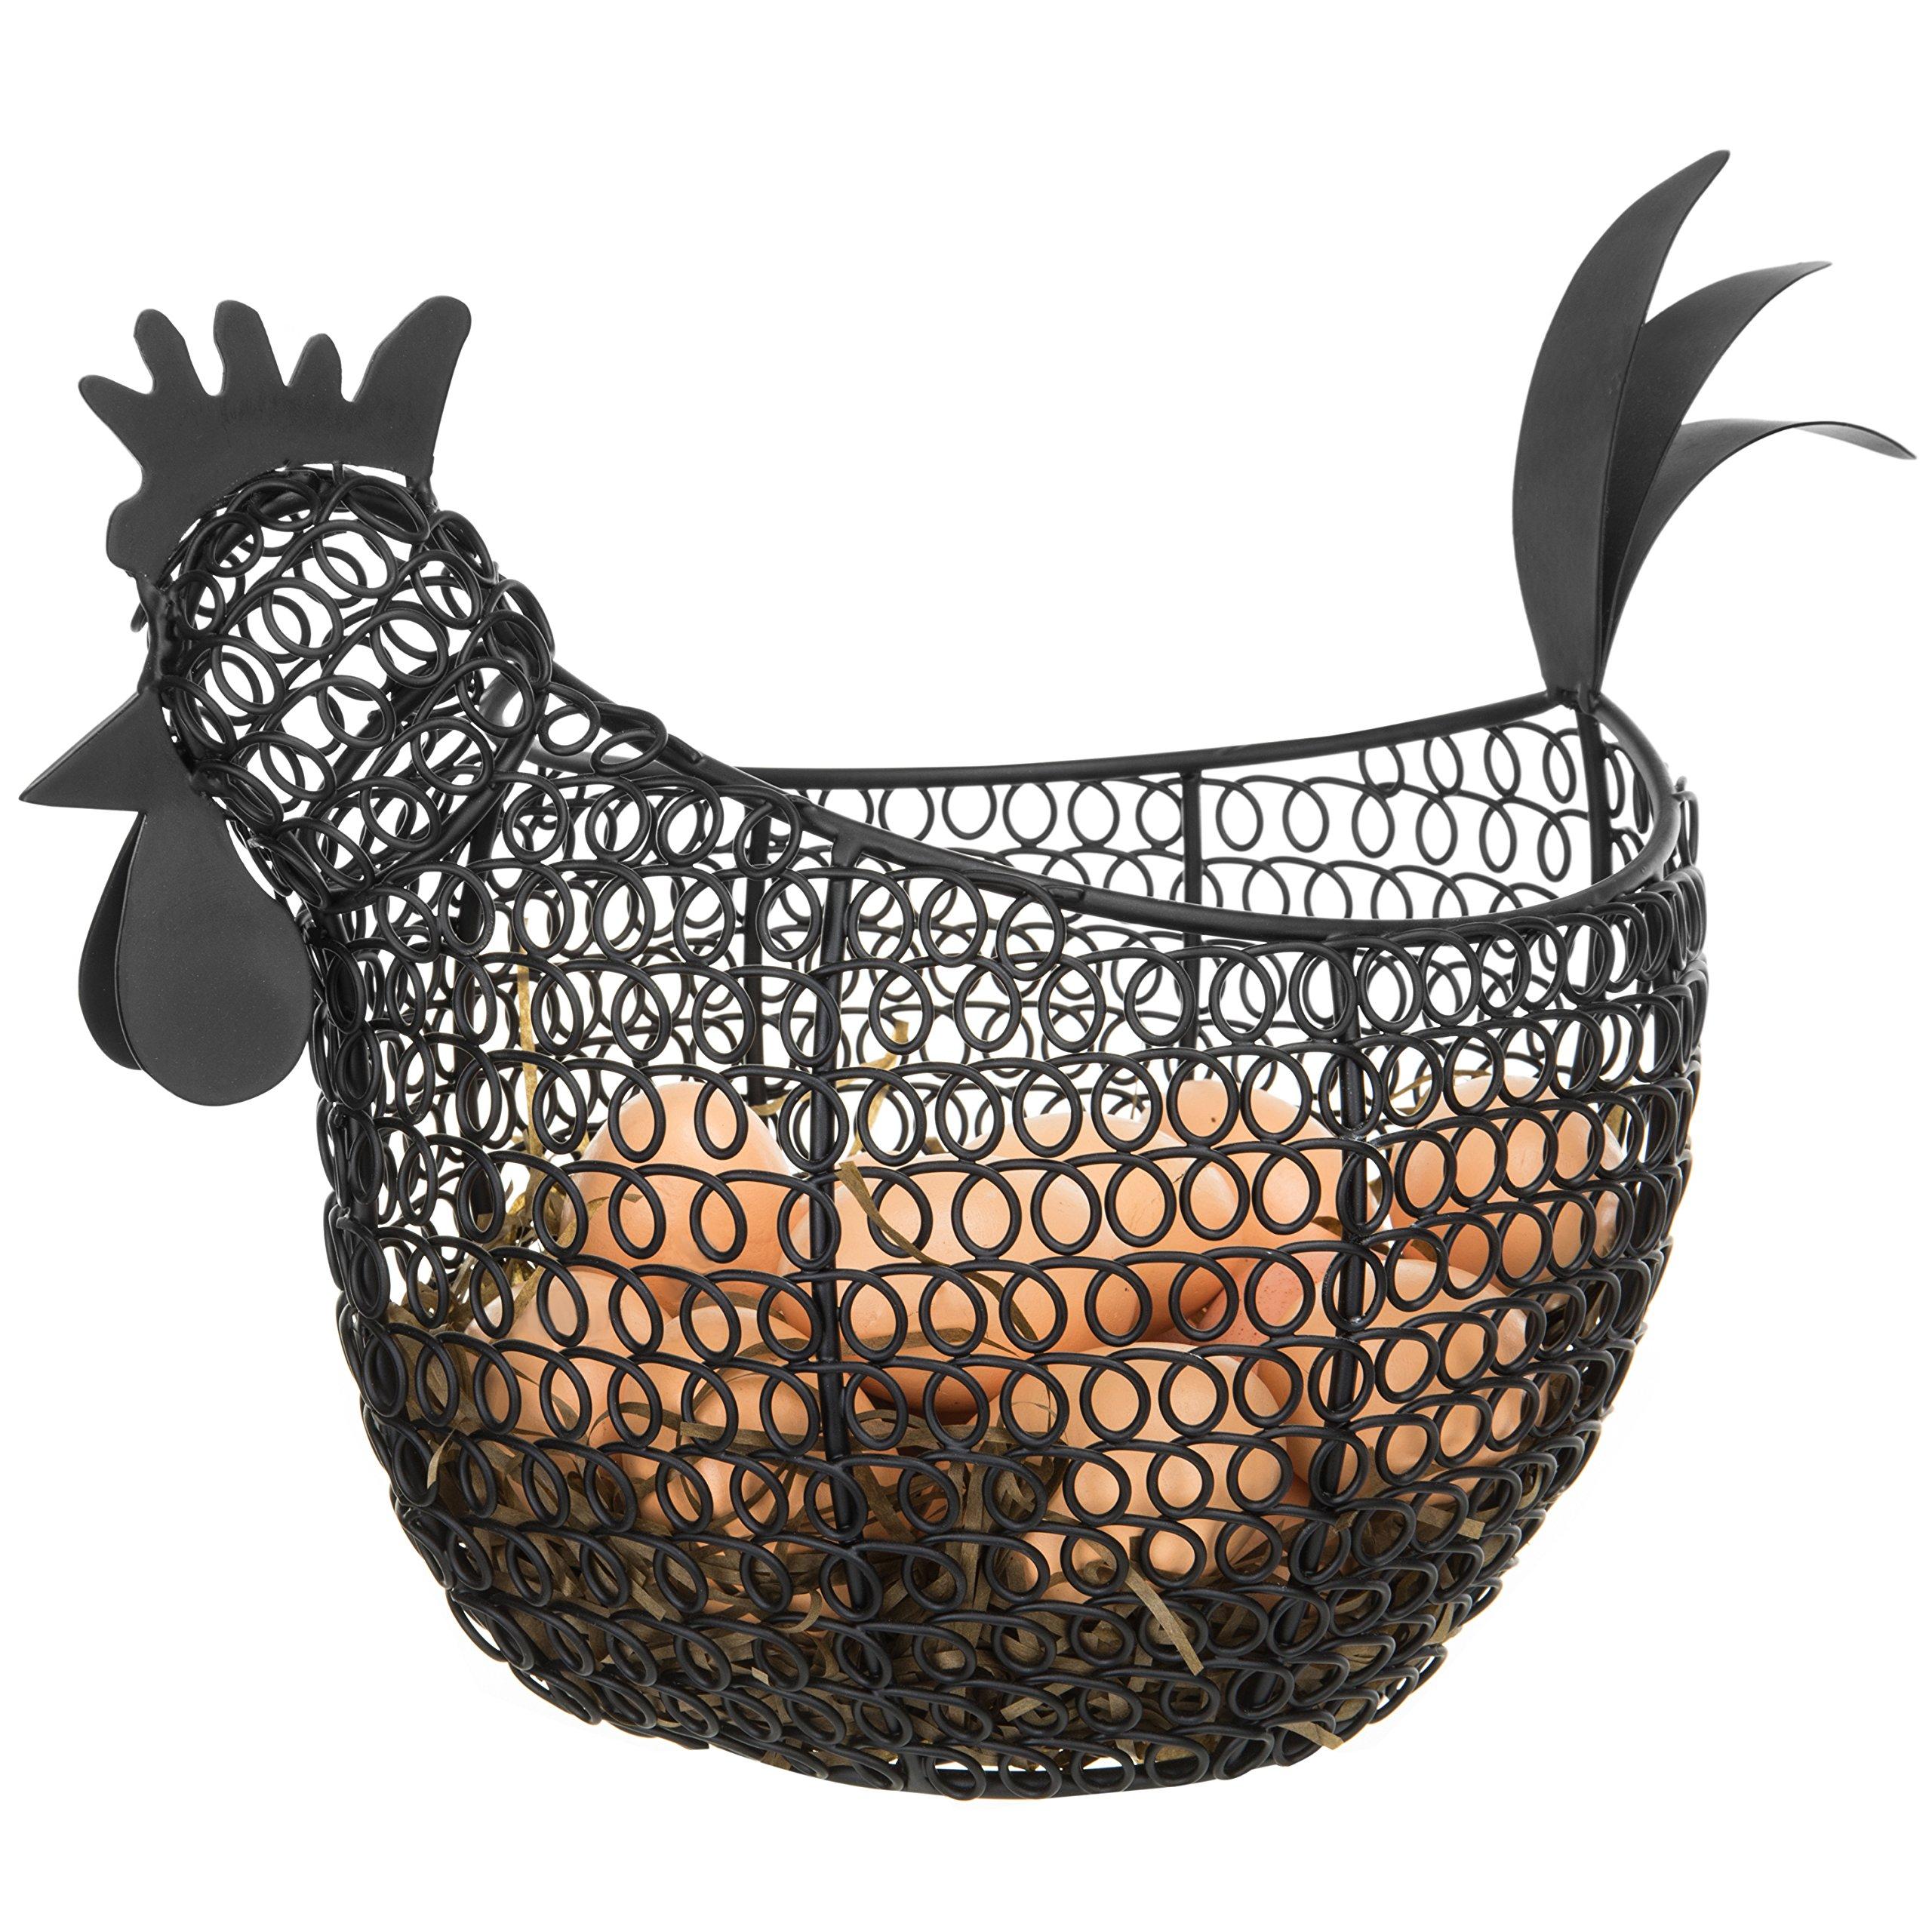 MyGift Aesthetic Black Metal Wire Chicken-Shaped Egg Storage Basket